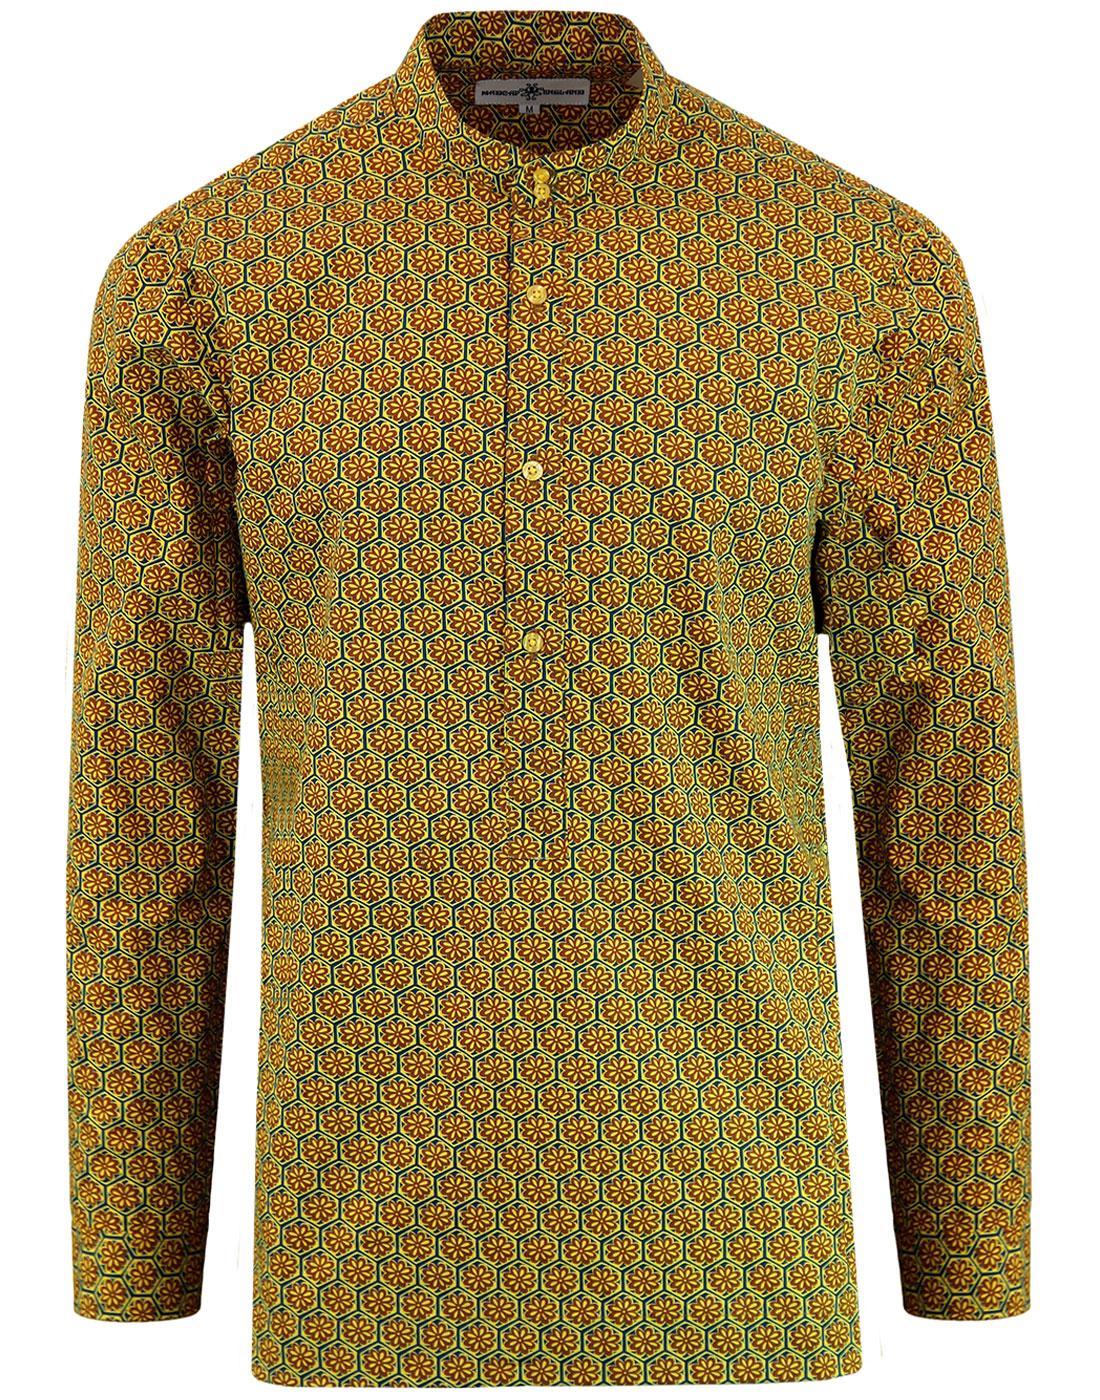 Middle Earth MADCAP ENGLAND 60s Mod Kaftan Shirt